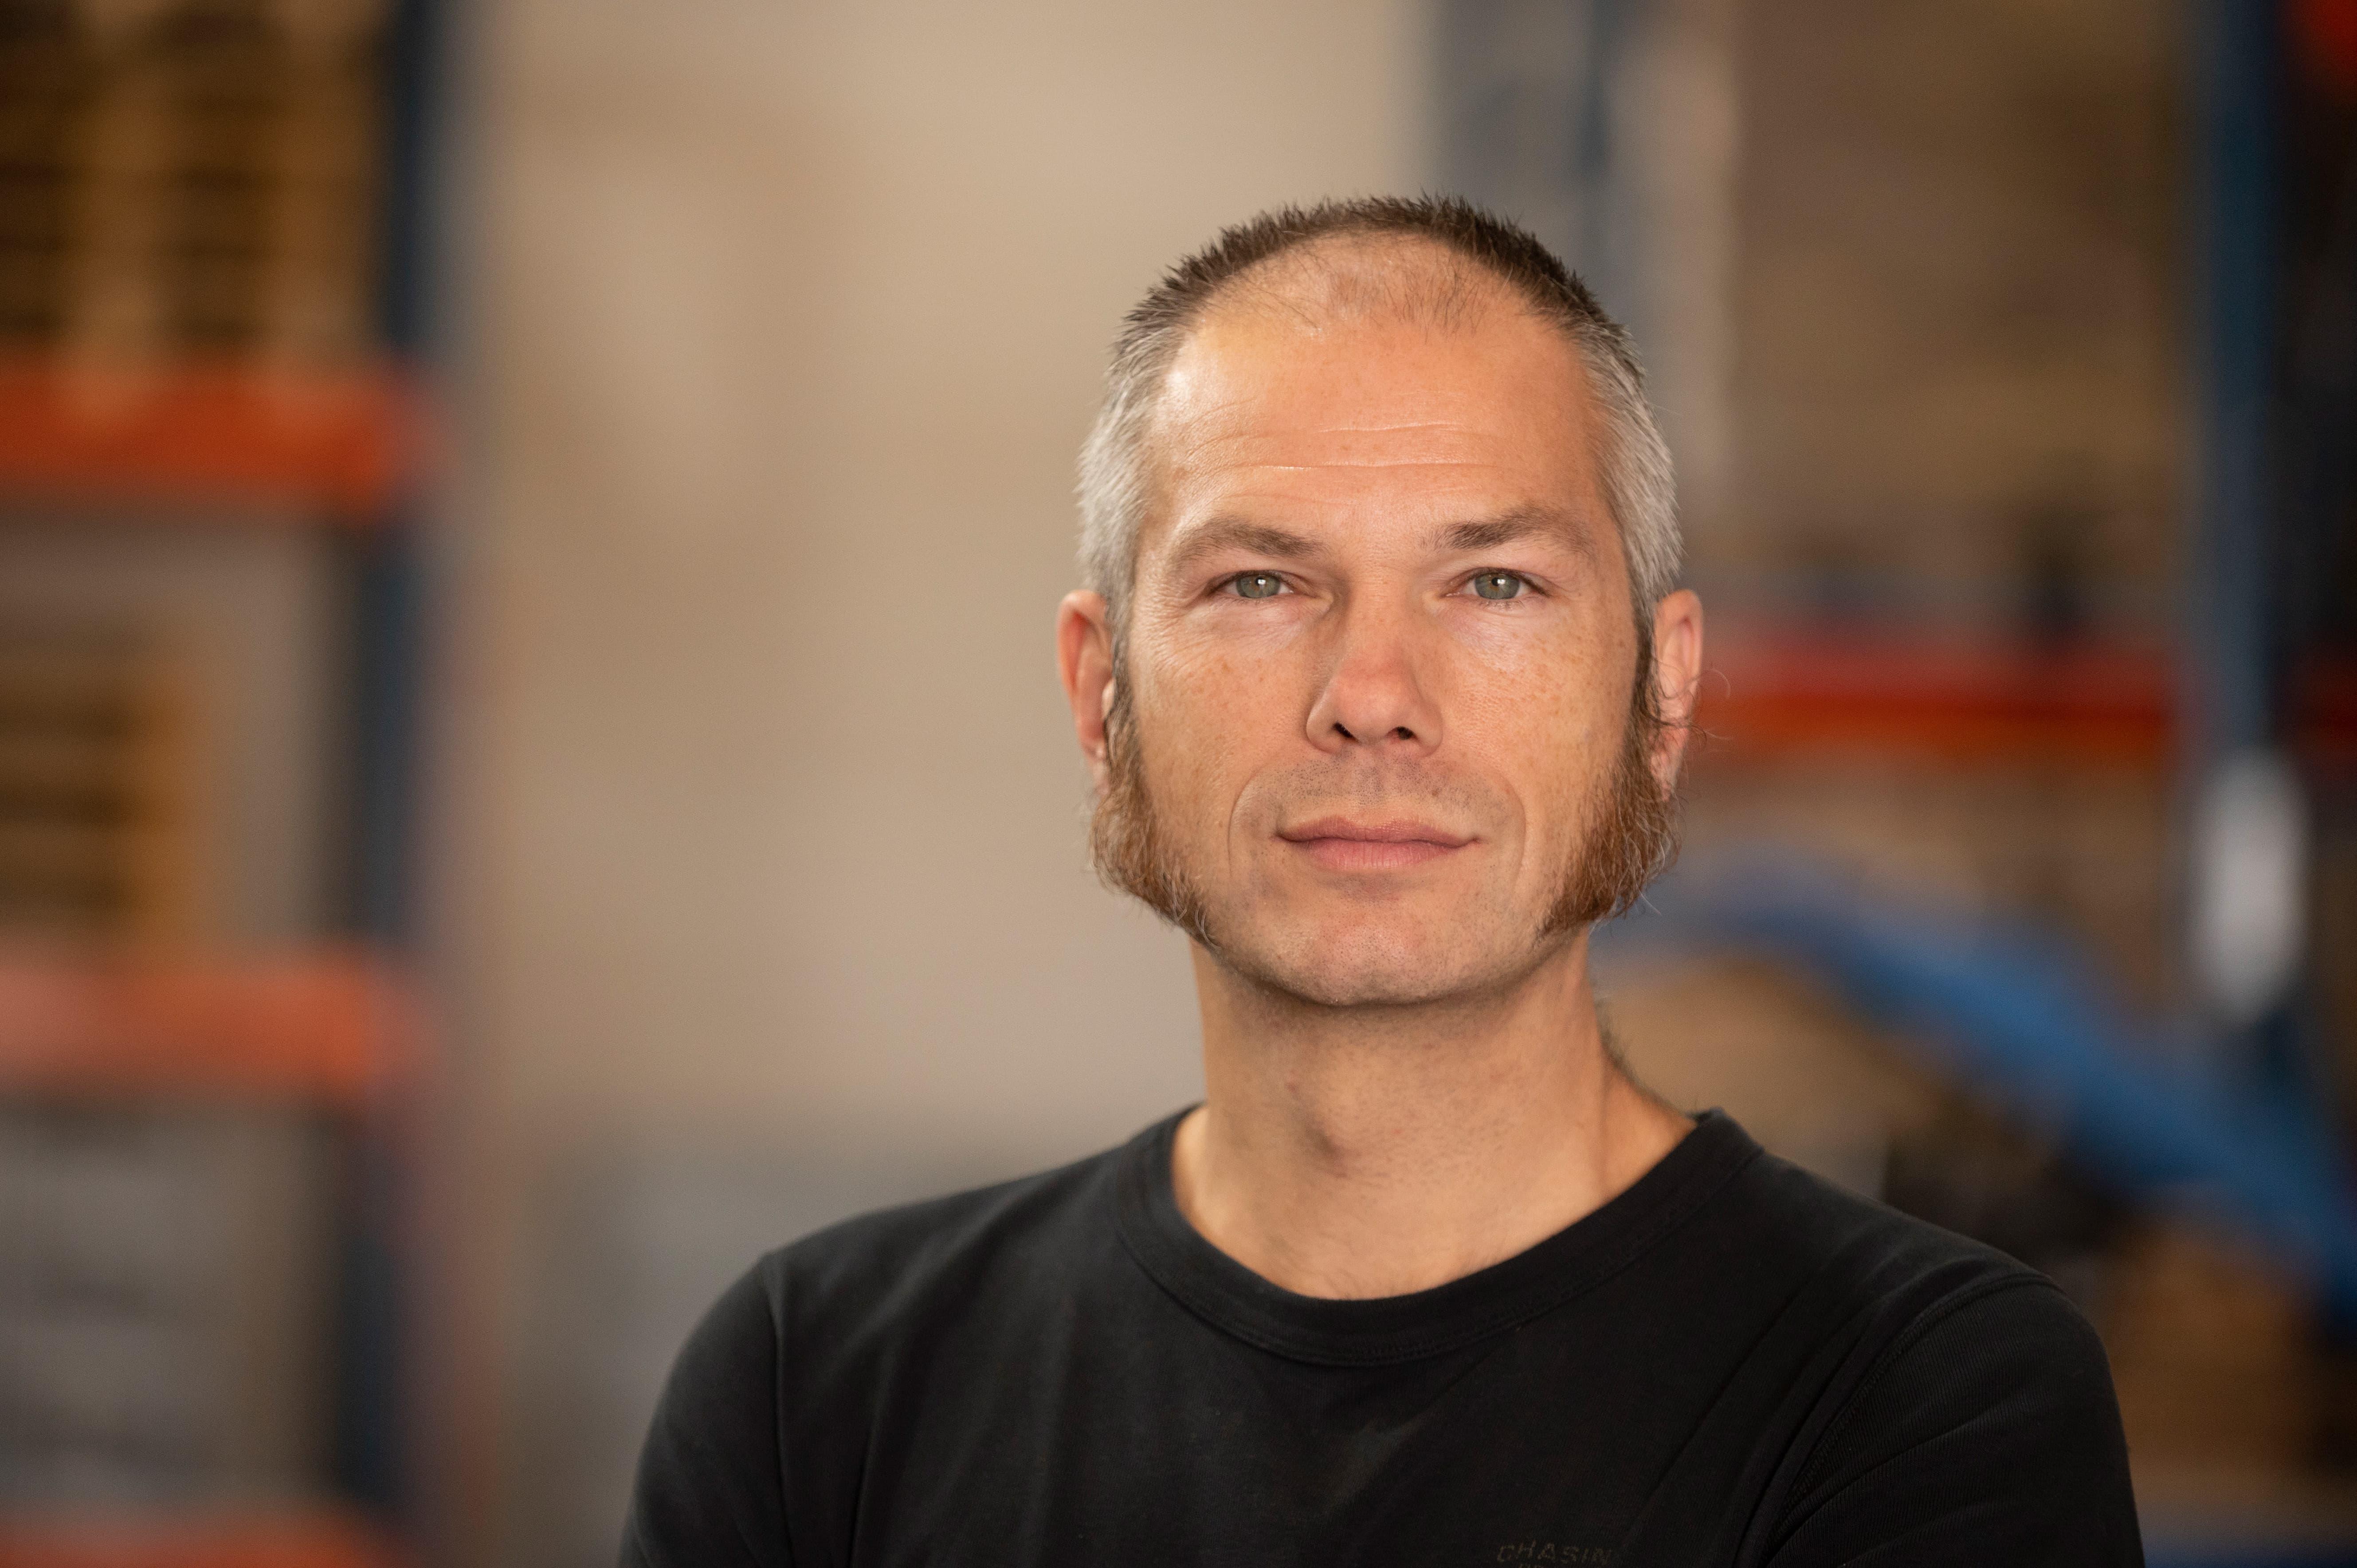 Picture of Mark Hakbijl